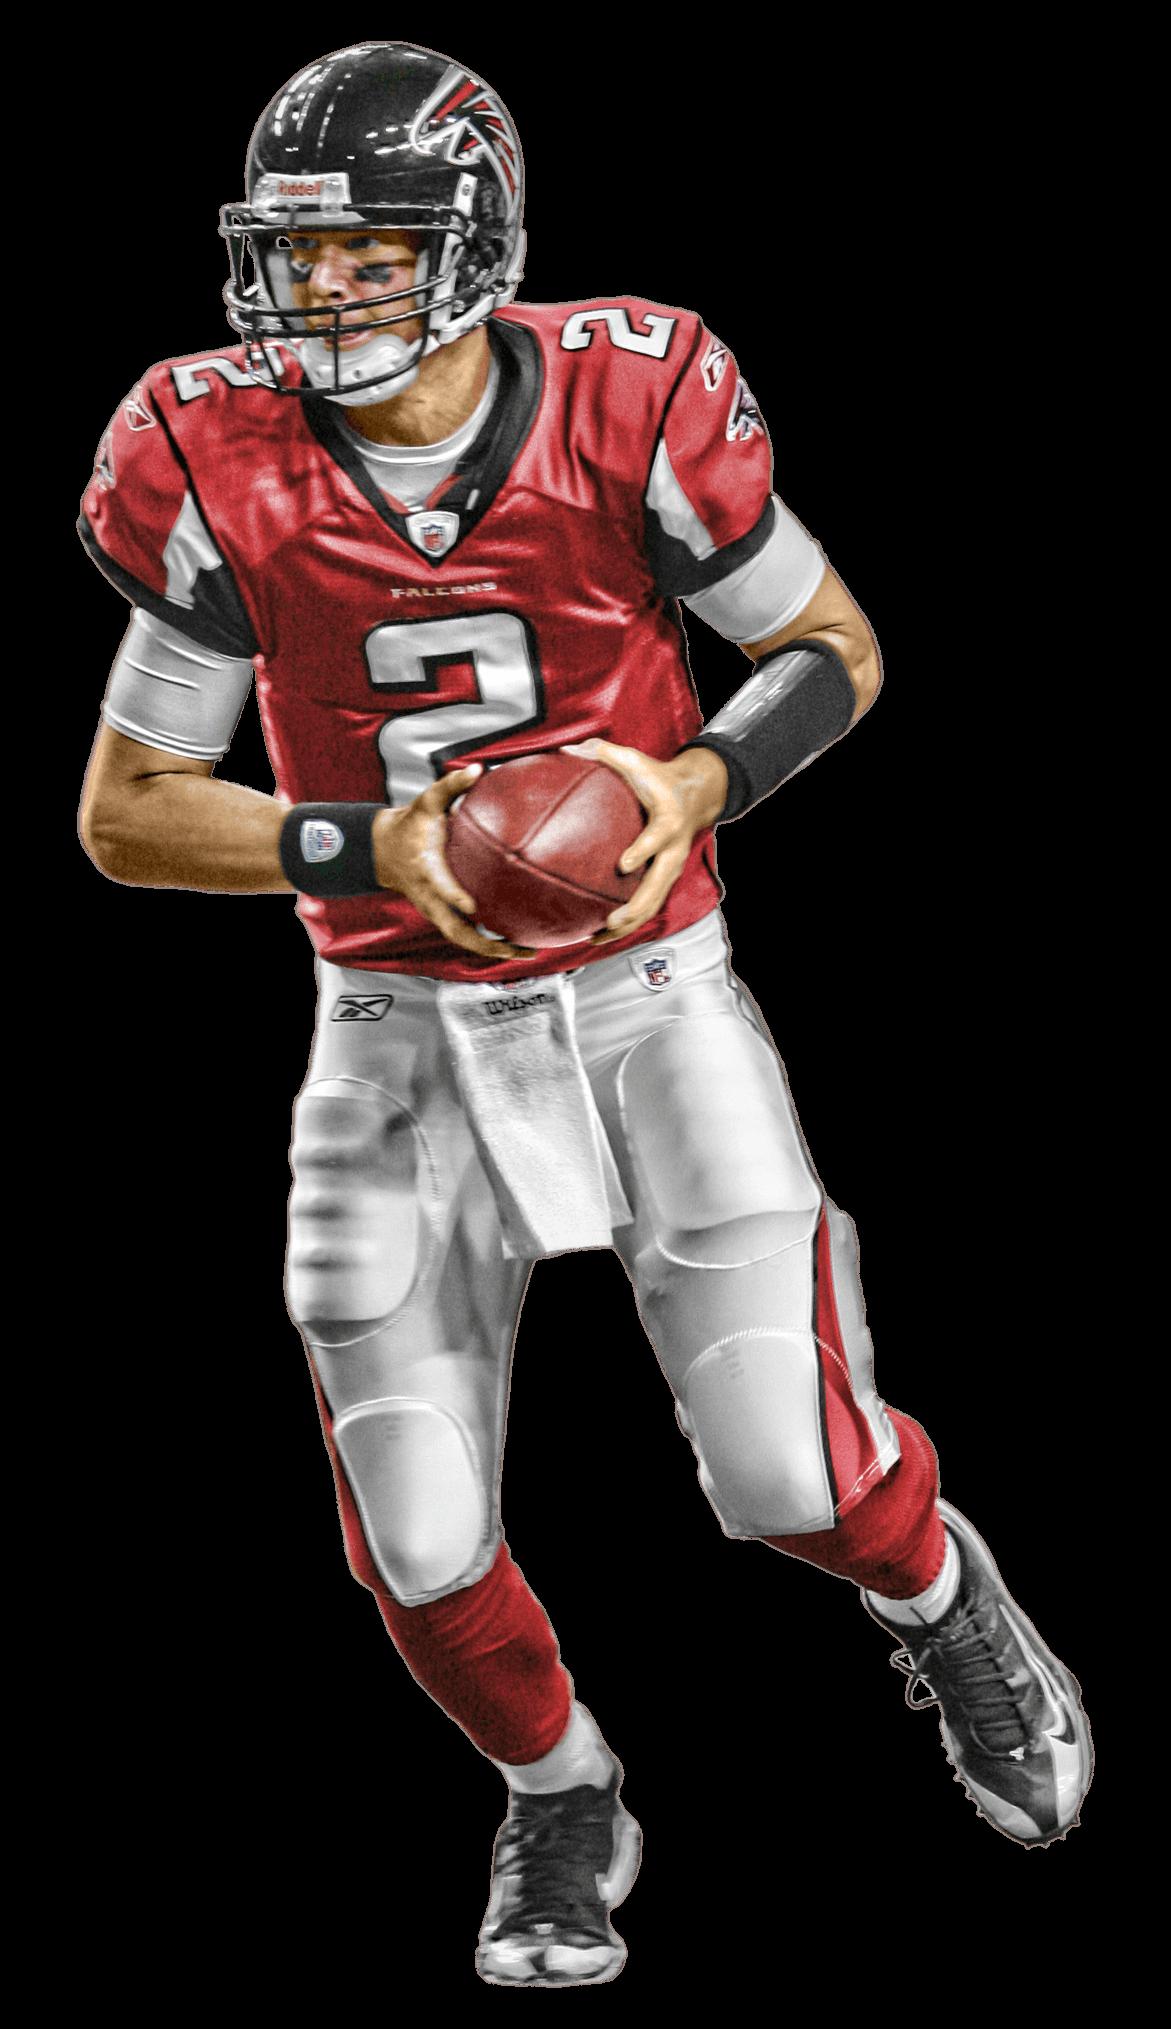 Football England Falcons Nfl Bowl American Patriots Football American Football Football Images